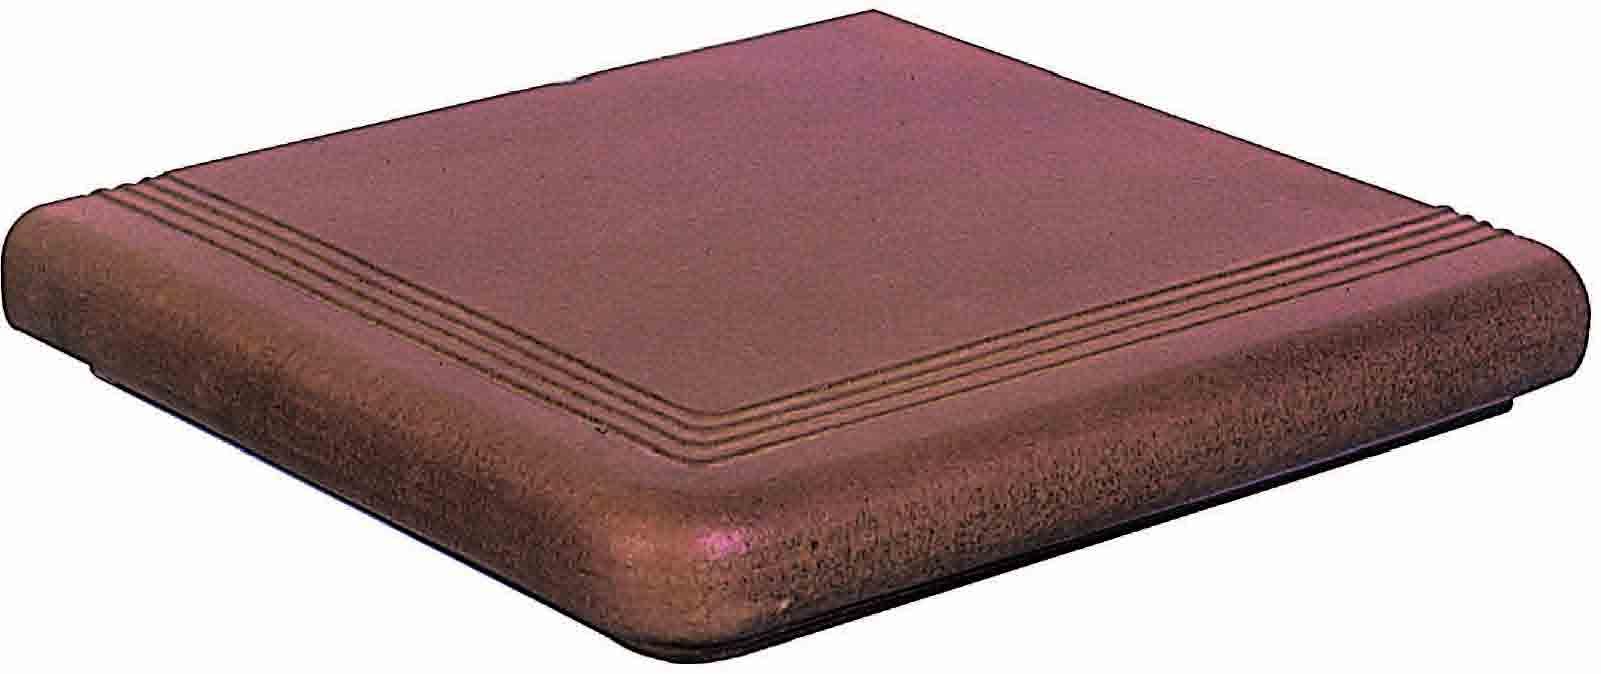 Esquina Florentina Tabaco Угловая ступень 0276421 33,3x33,3x5,4 ступень gres de aragon rocks esquina arena 33x33